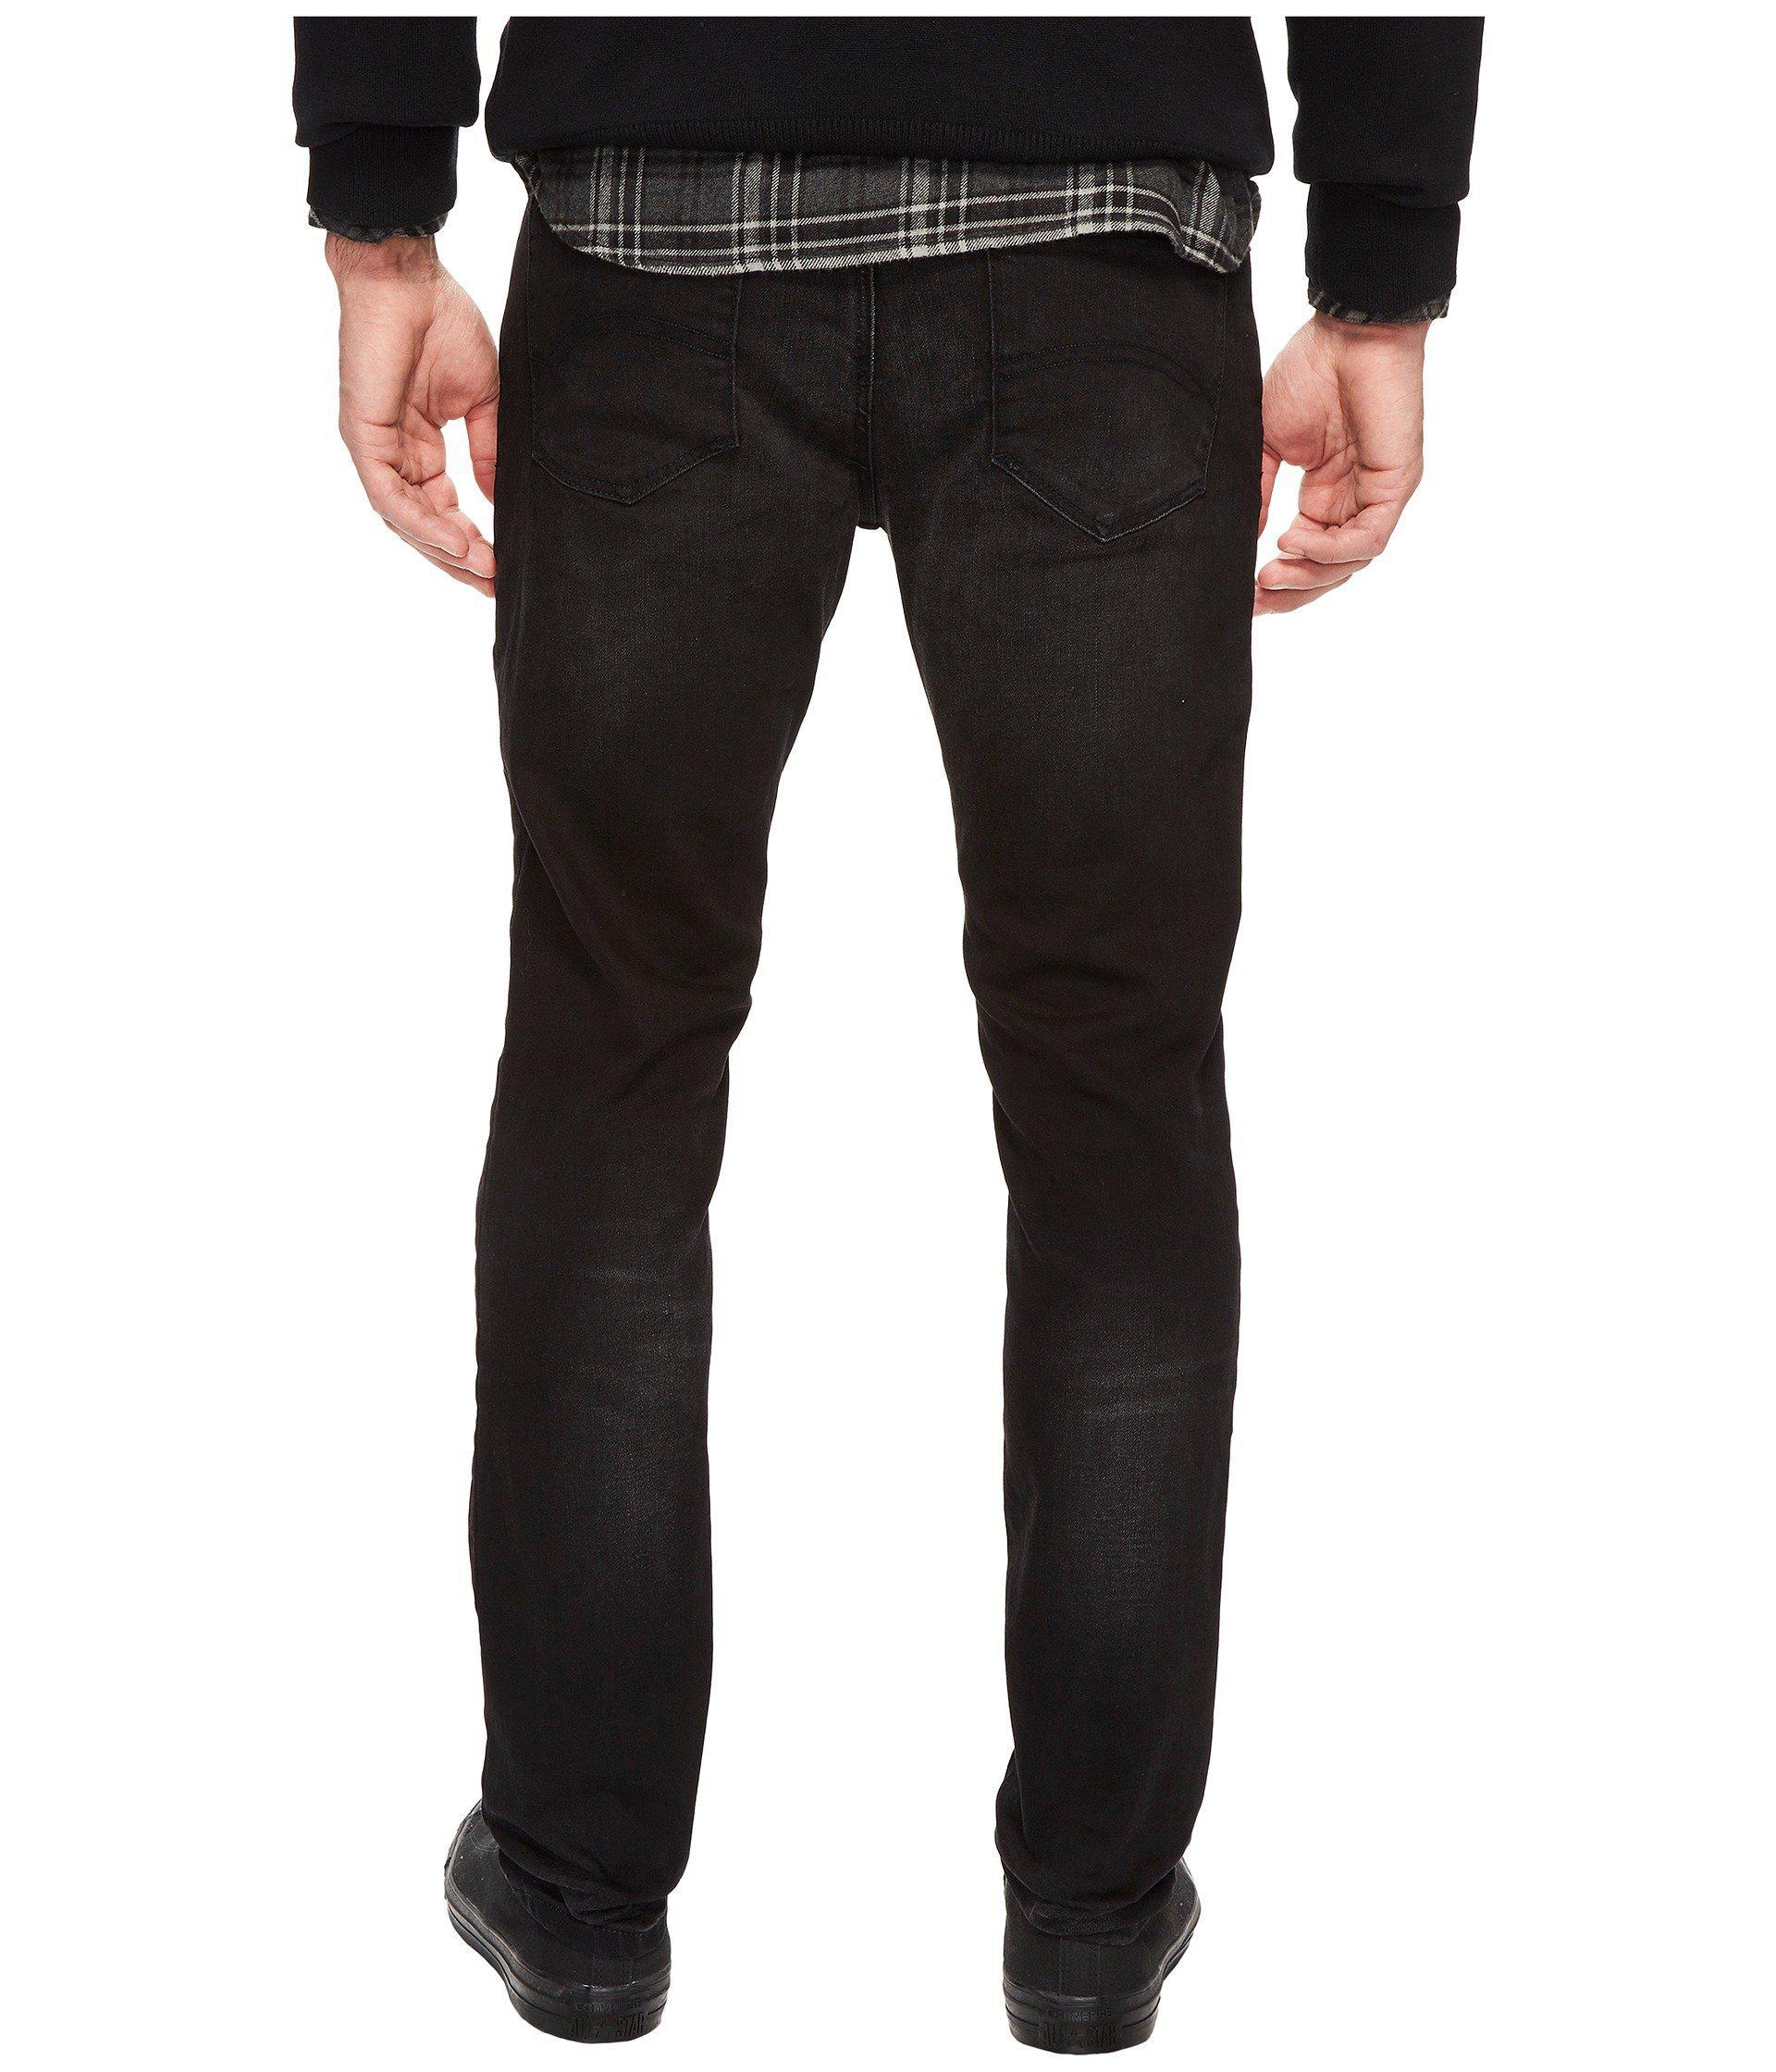 b799ddfd025f Lyst - Hilfiger Denim Slim Tapered Steve Jeans in Black for Men